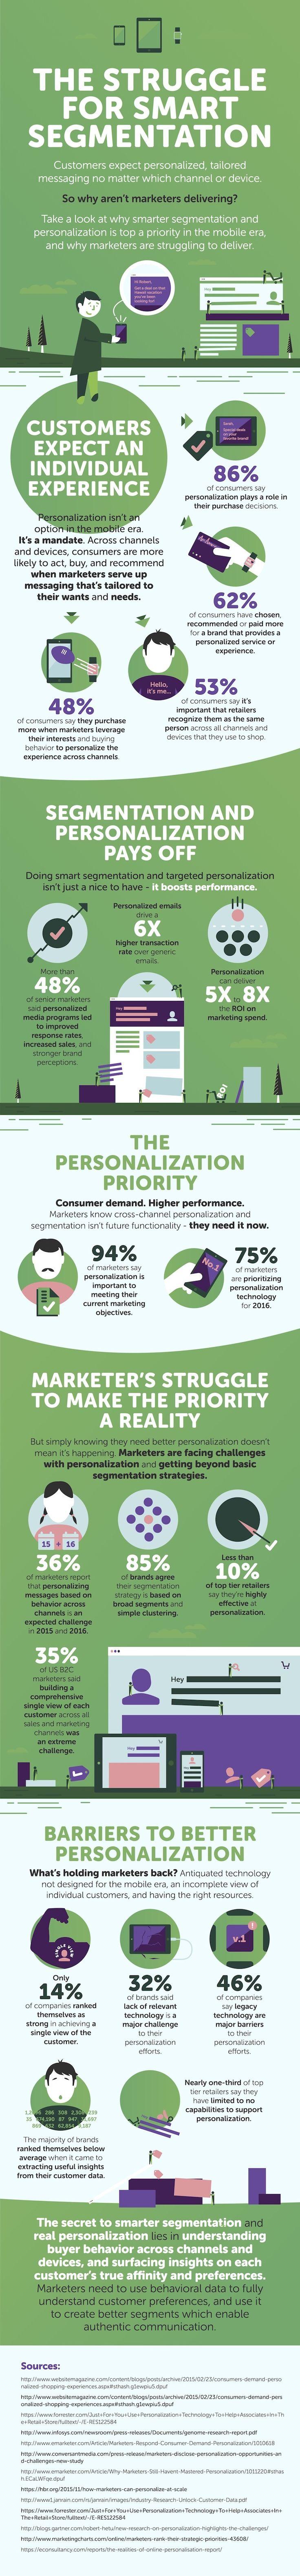 The Struggle for Smart Segmentation #Infographic #Advertising #Marketing